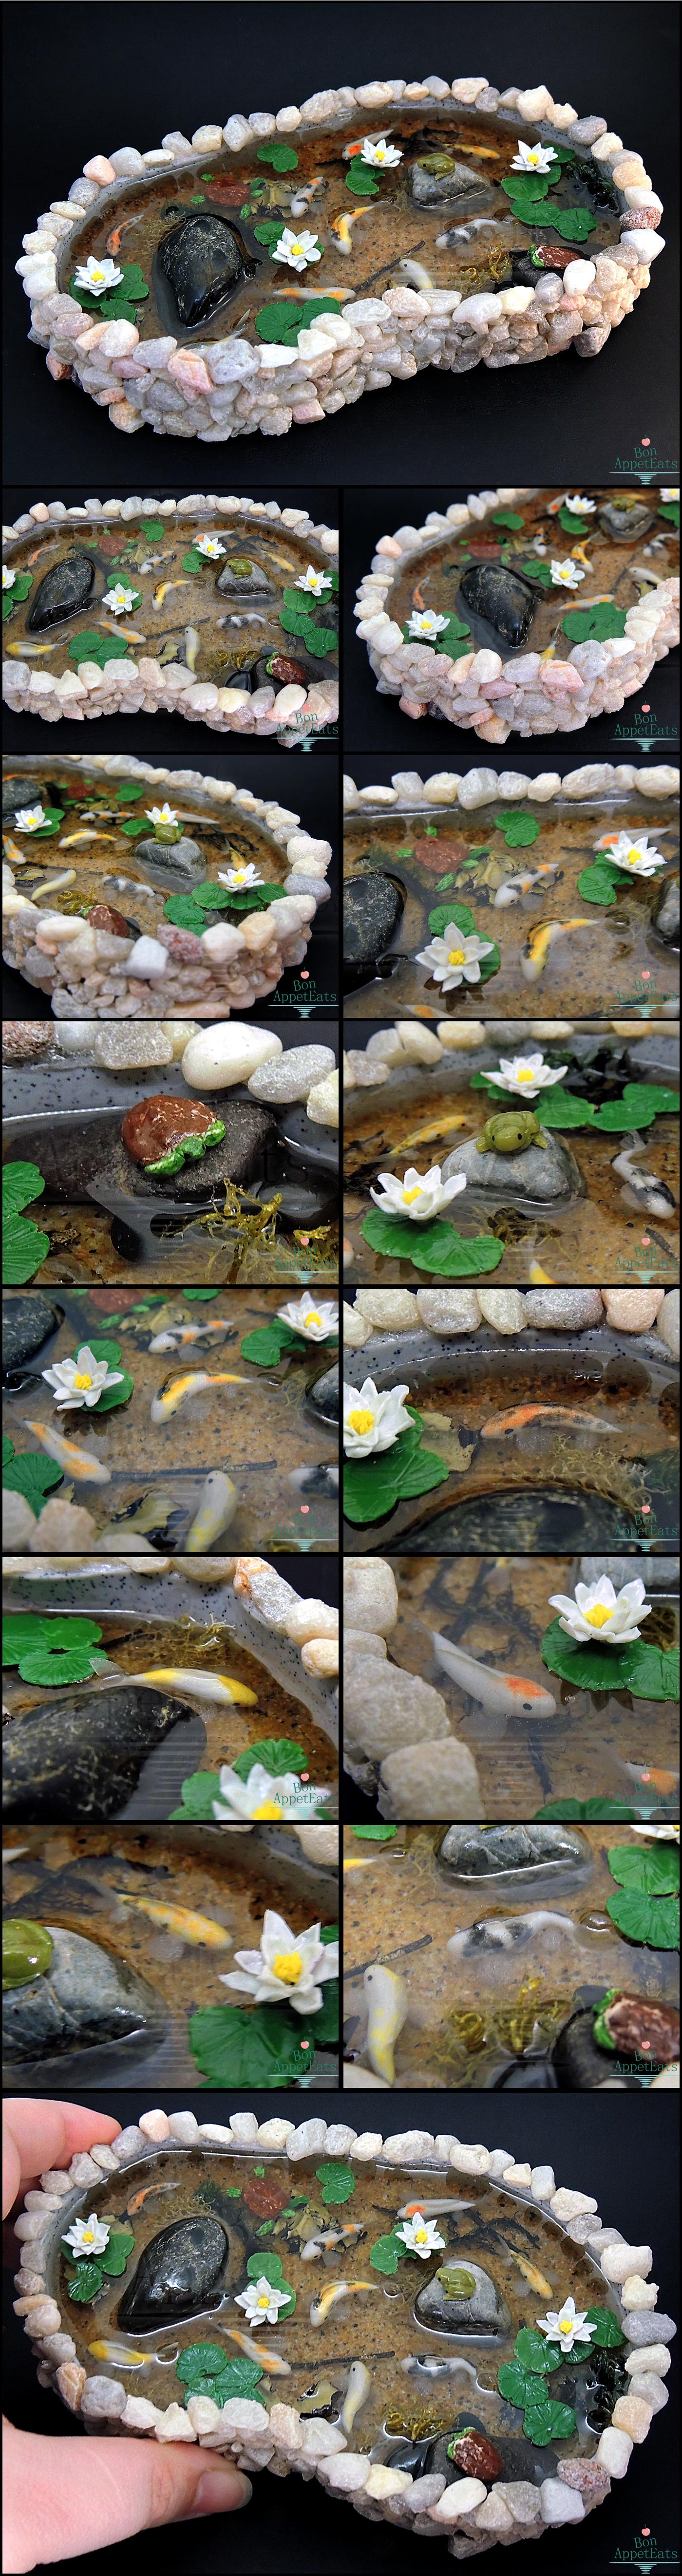 Commission Large Stone Pond By Bon Appeteats On Deviantart